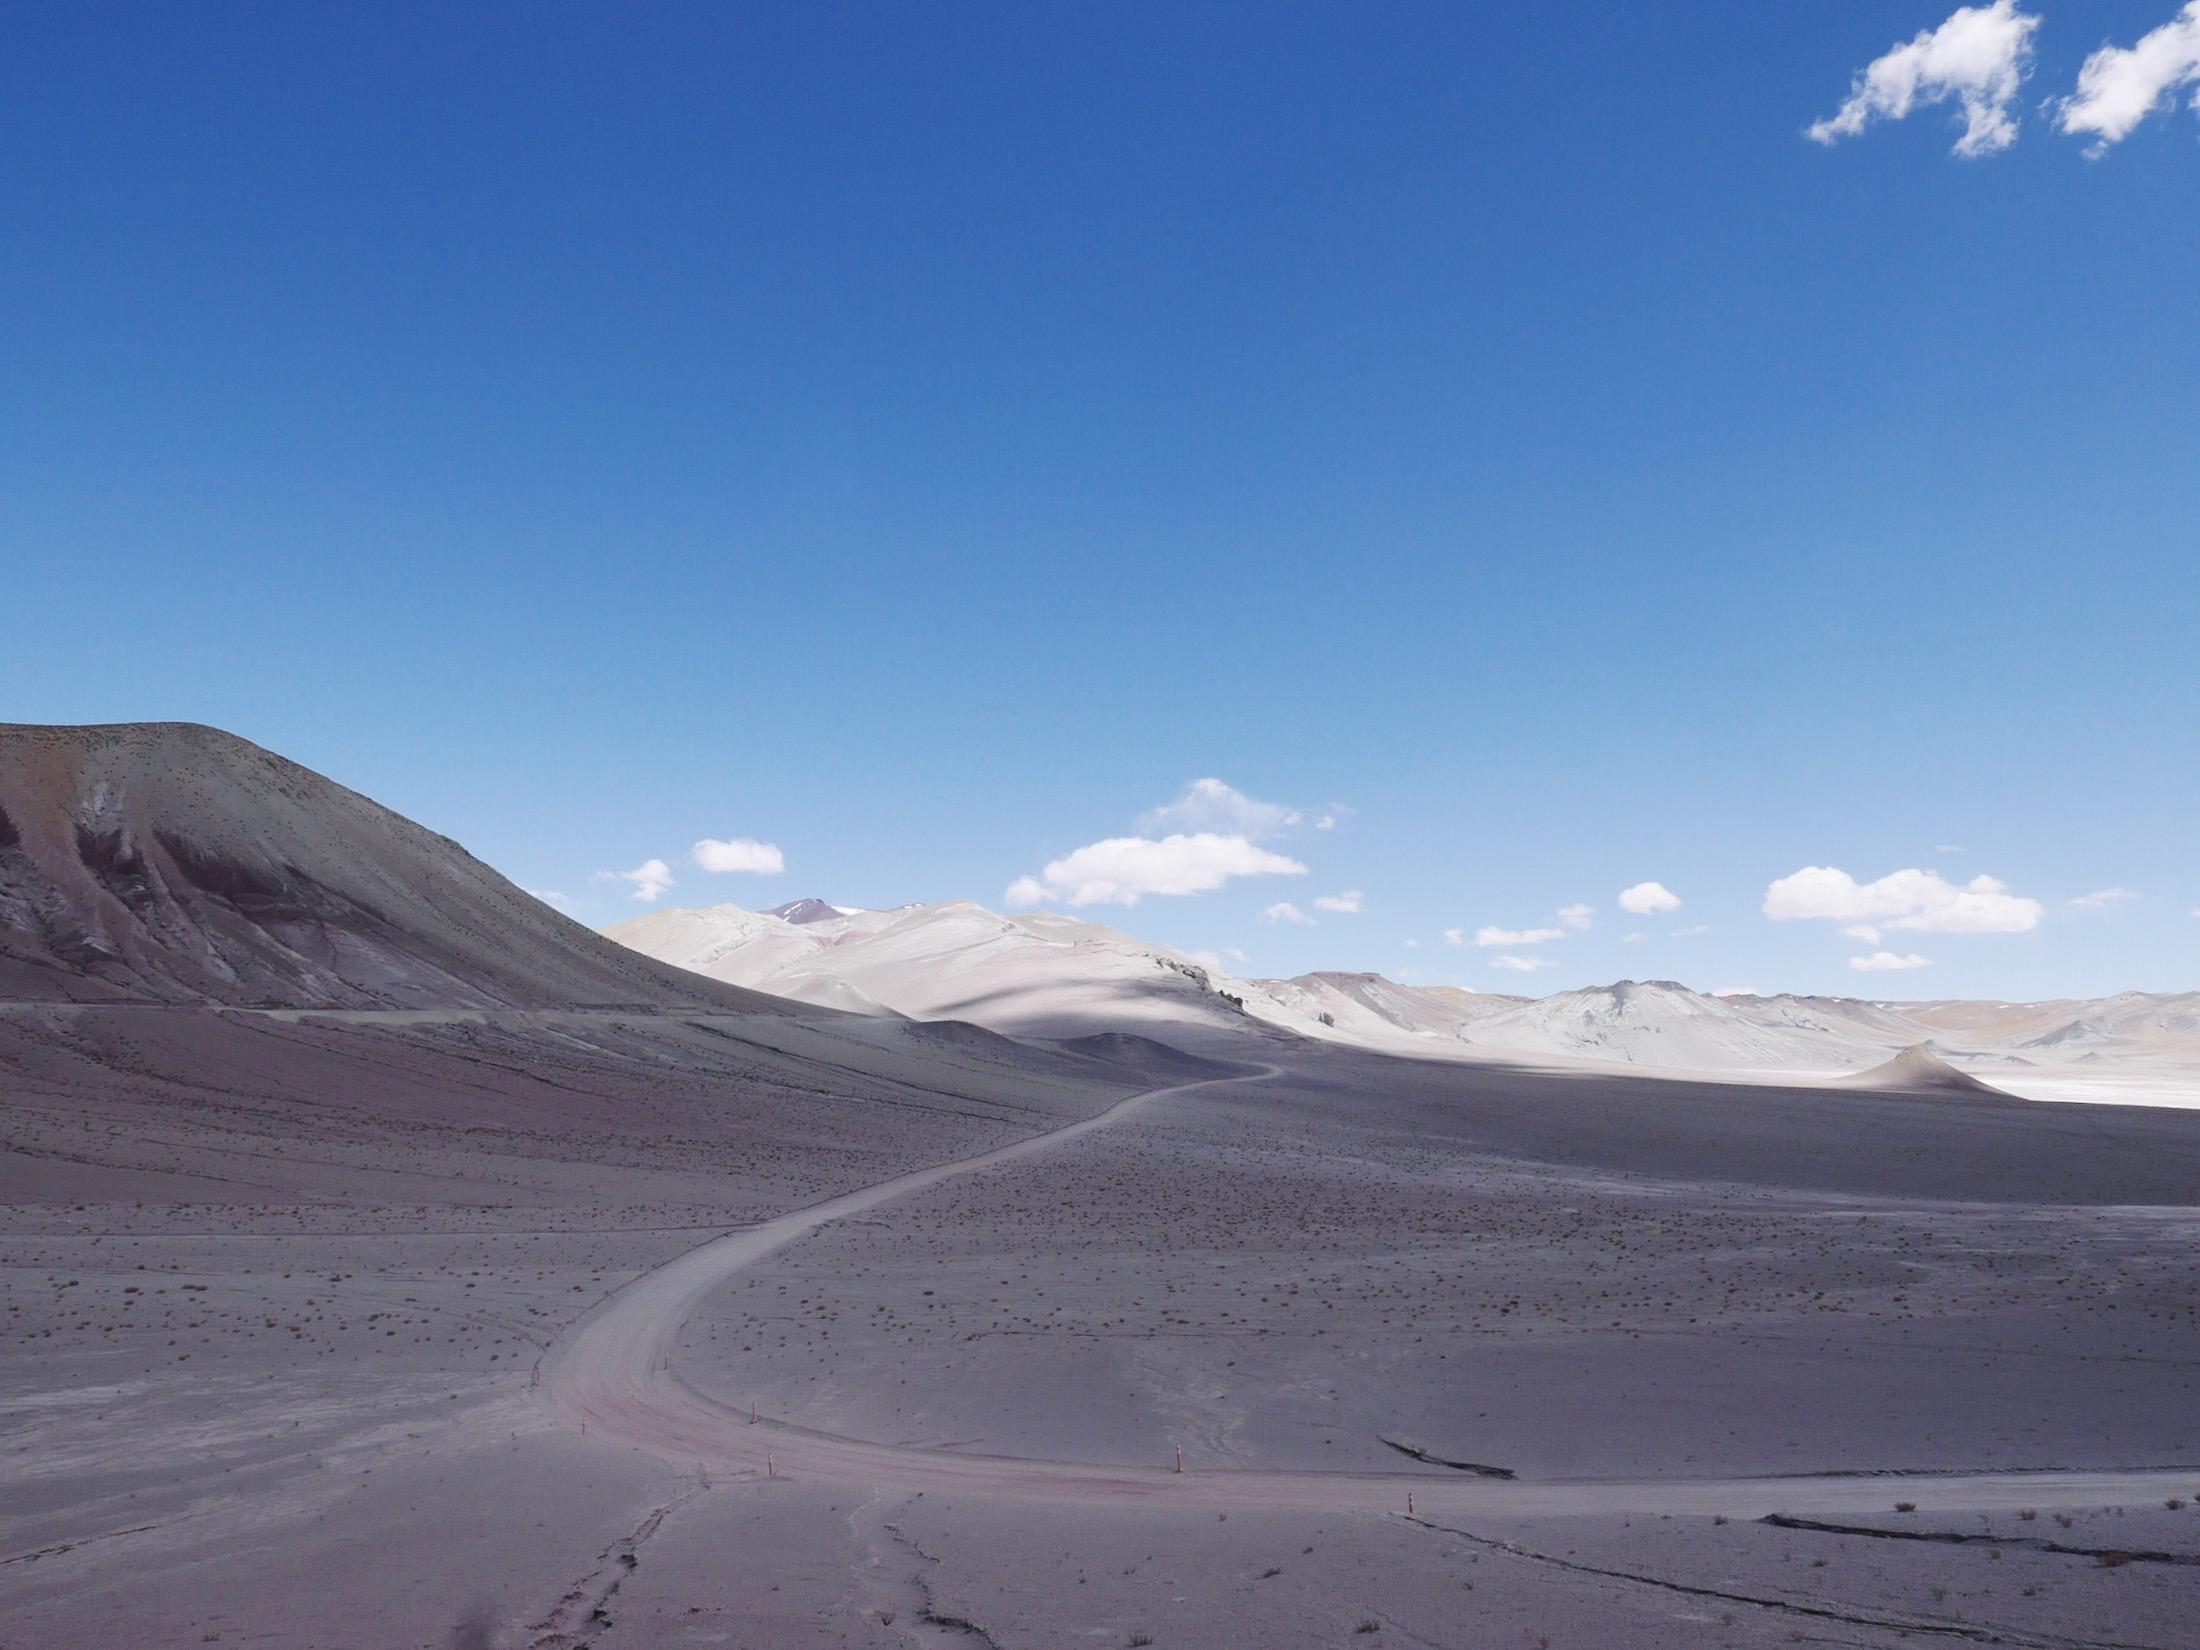 Dusty alien landscape before the Argentinian border.